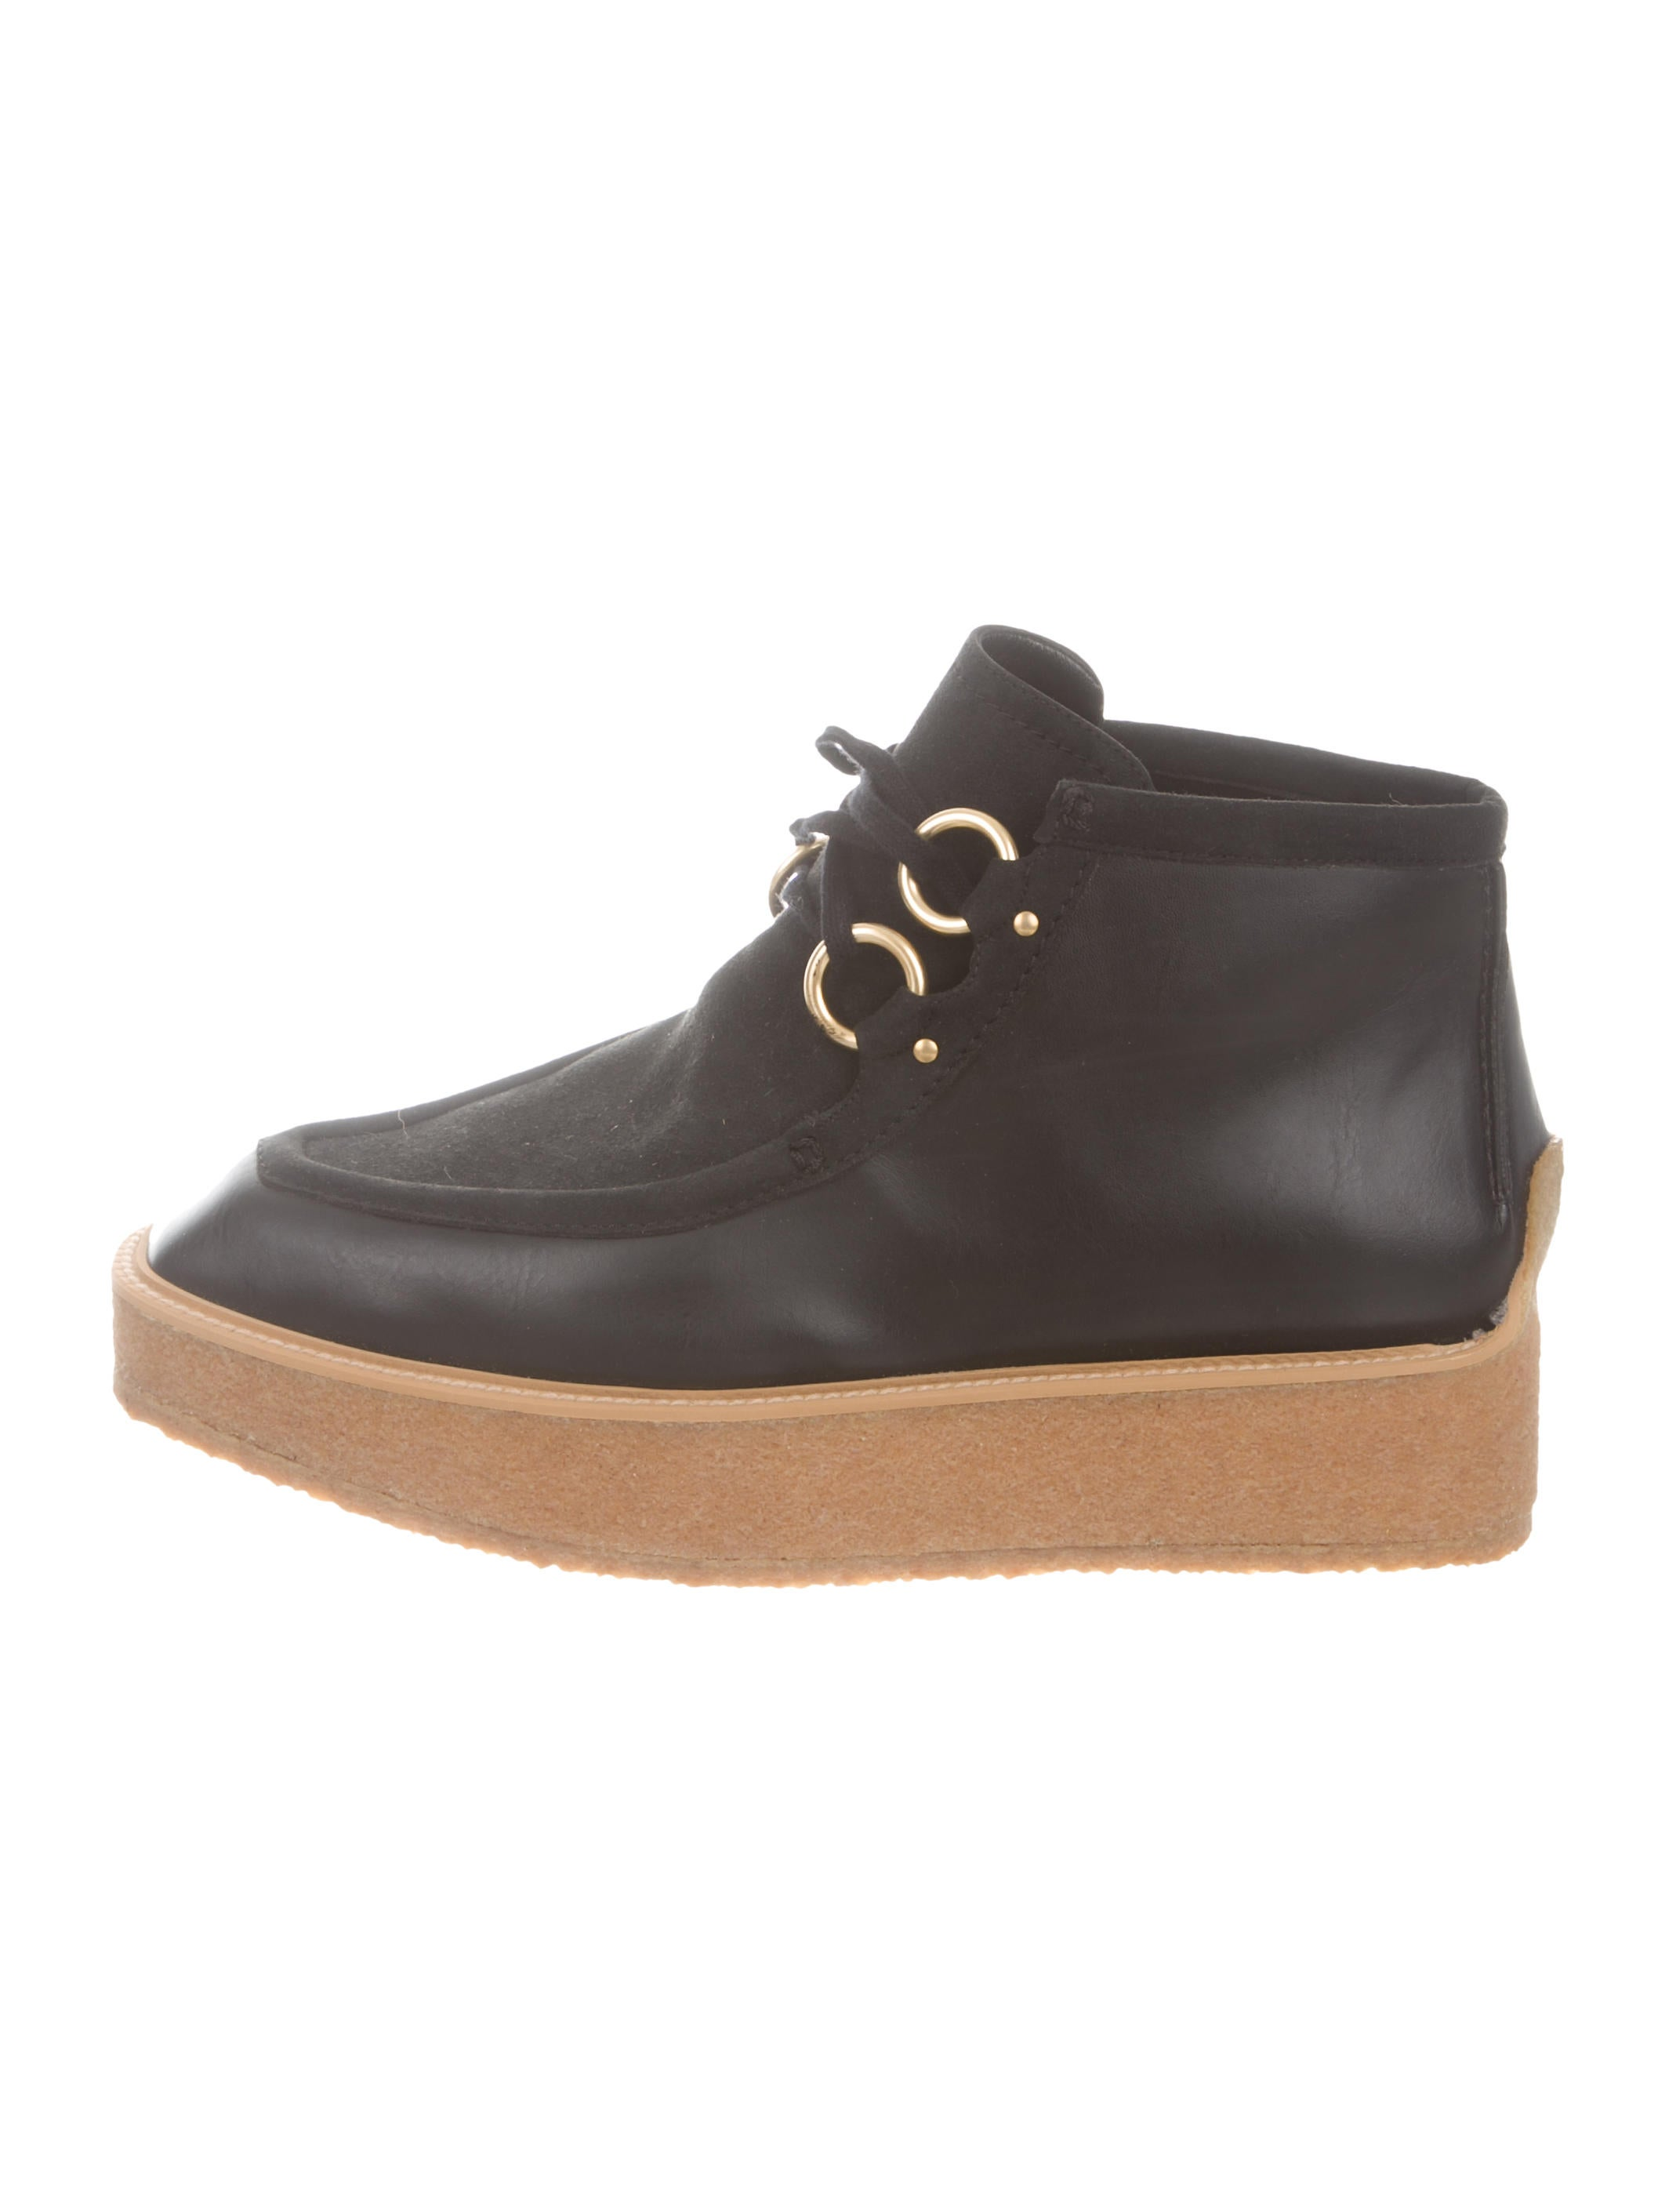 dca9dd881892 Stella McCartney Vegan Platform Ankle Booties - Shoes - STL89211 ...